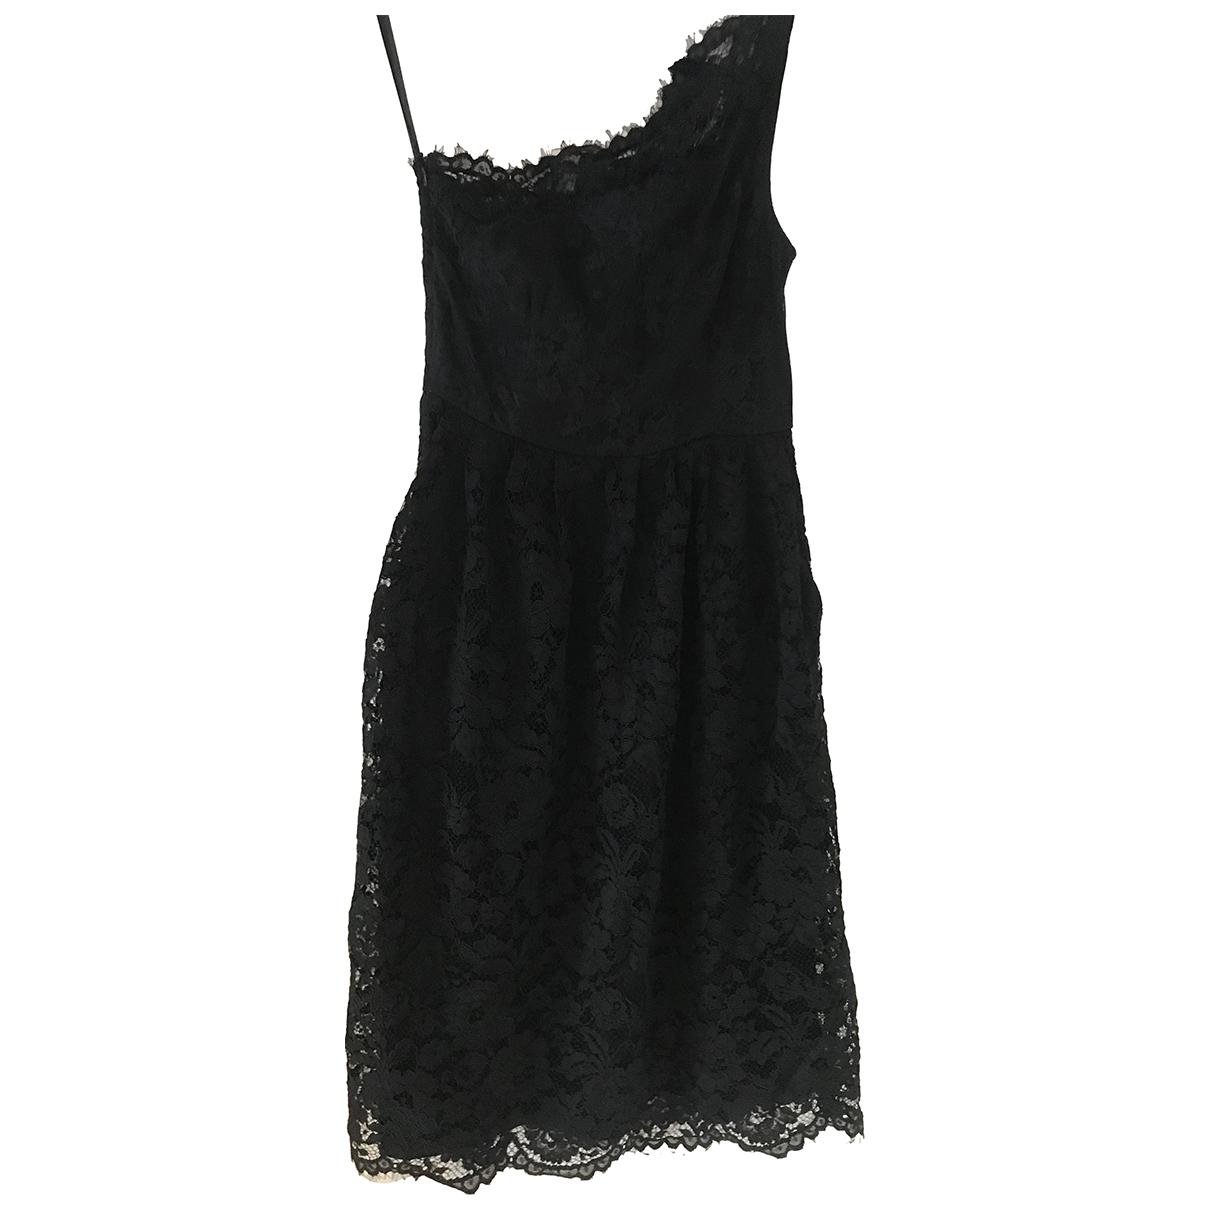 Whistles \N Black Lace dress for Women 10 UK